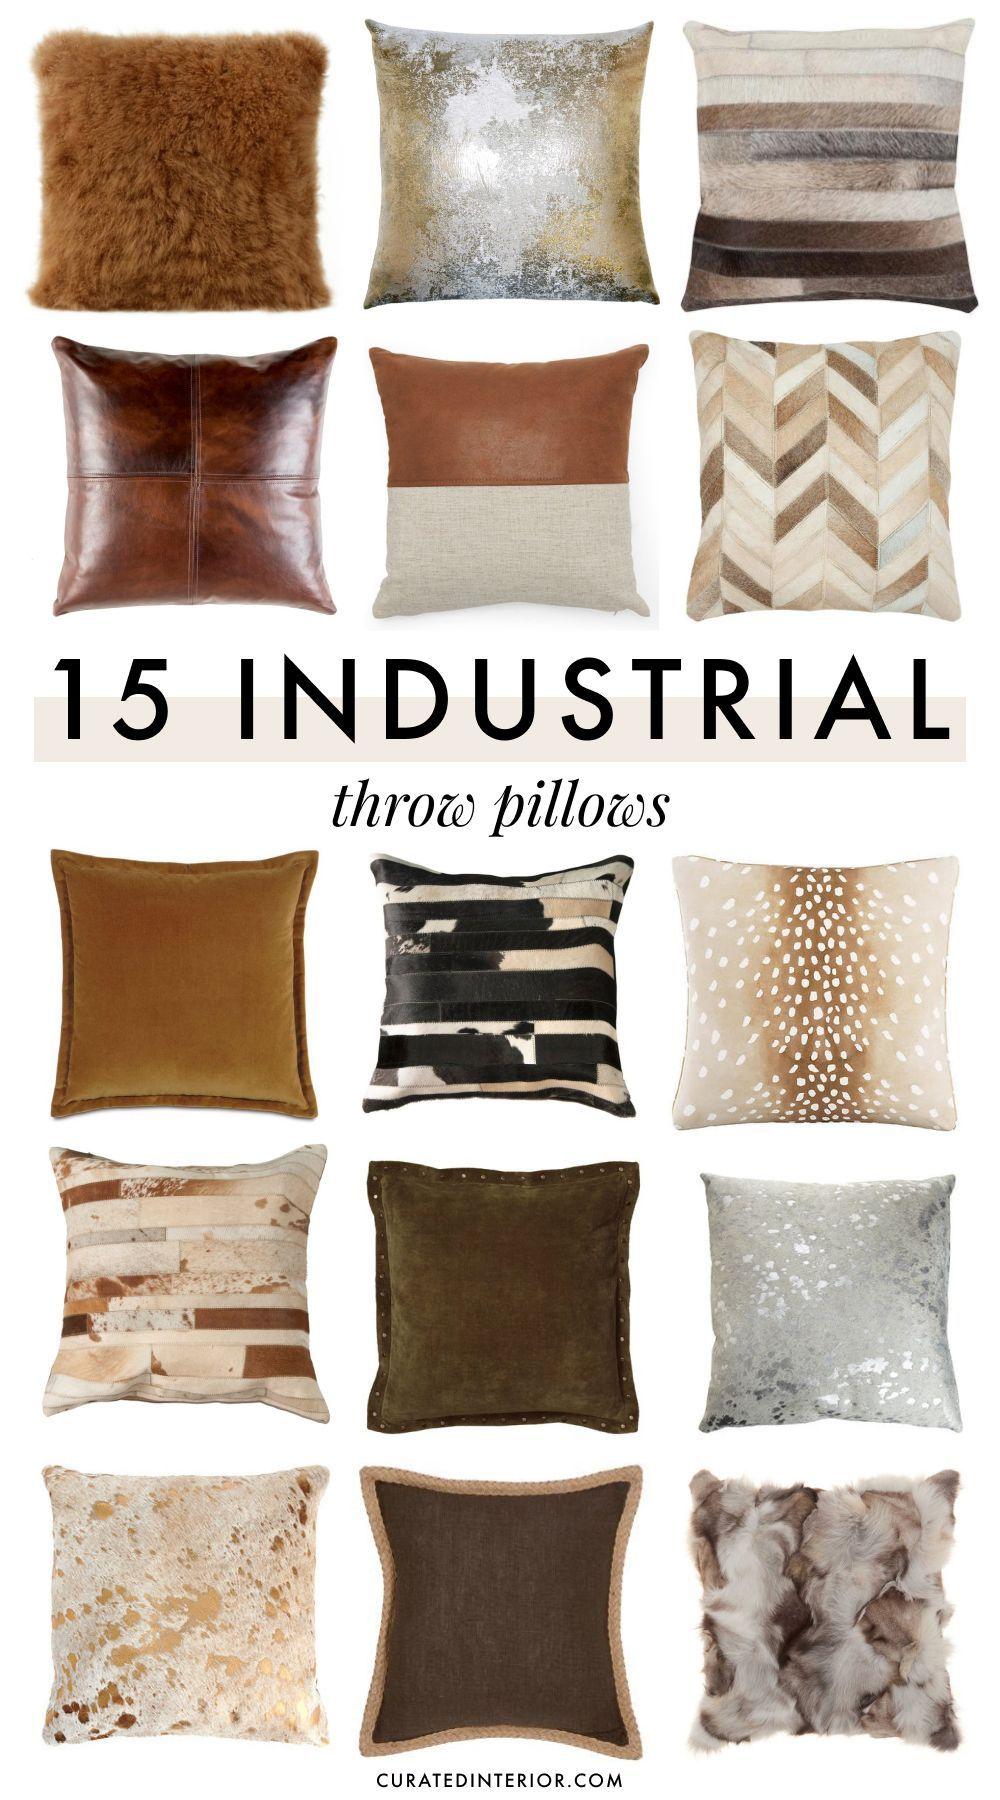 15 industrial throw pillows for an urban vibe warm home decor throw pillow styling industrial throws